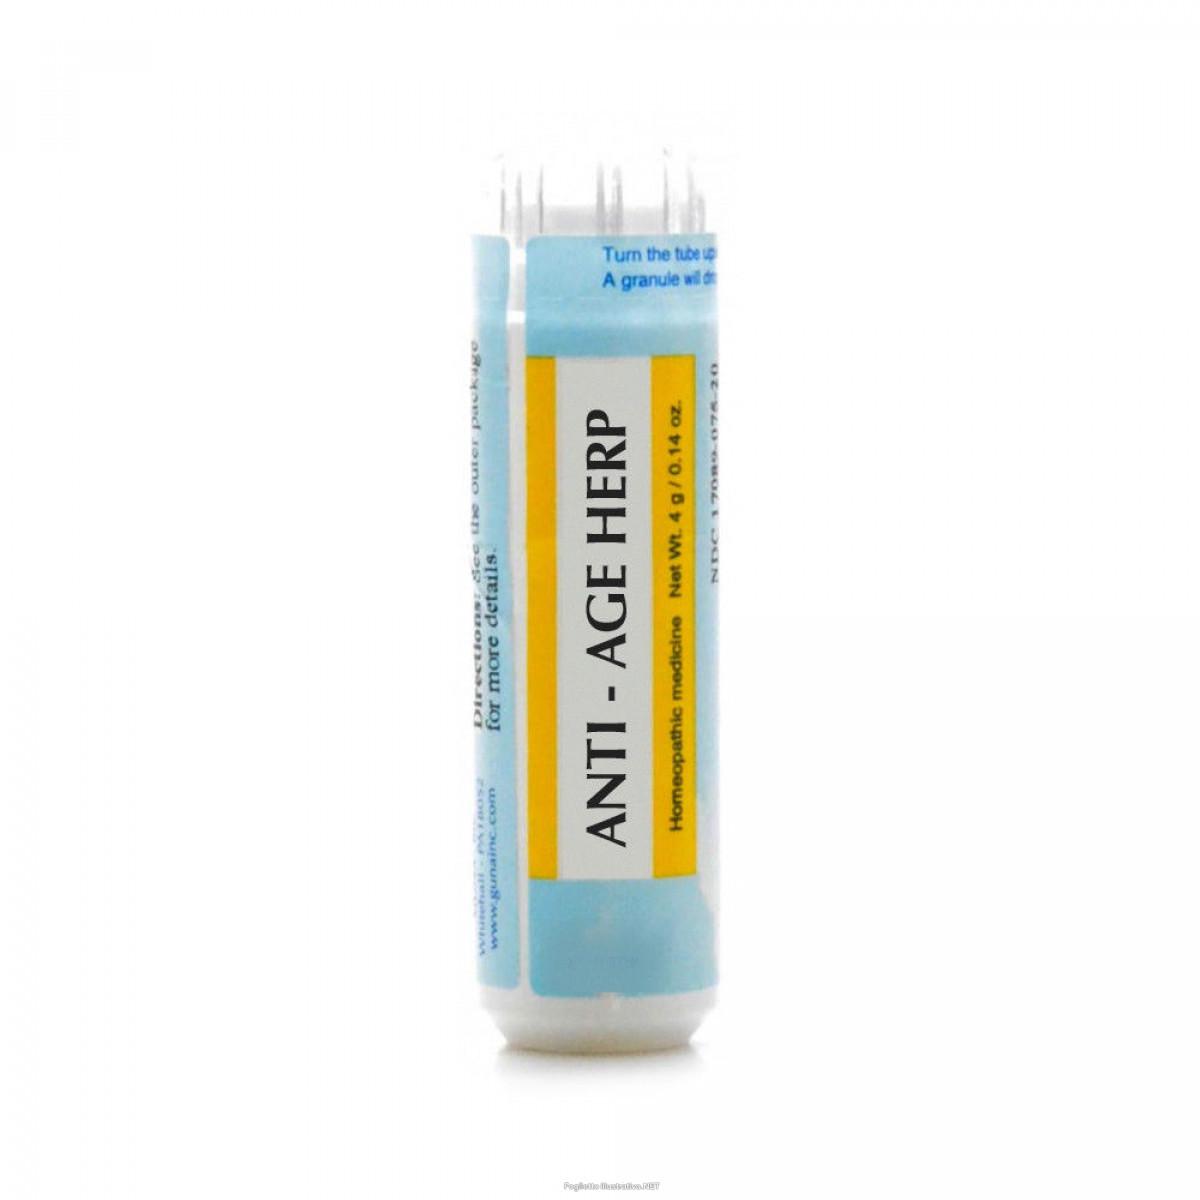 Antiage Herp Granuli 4g - Farmalilla